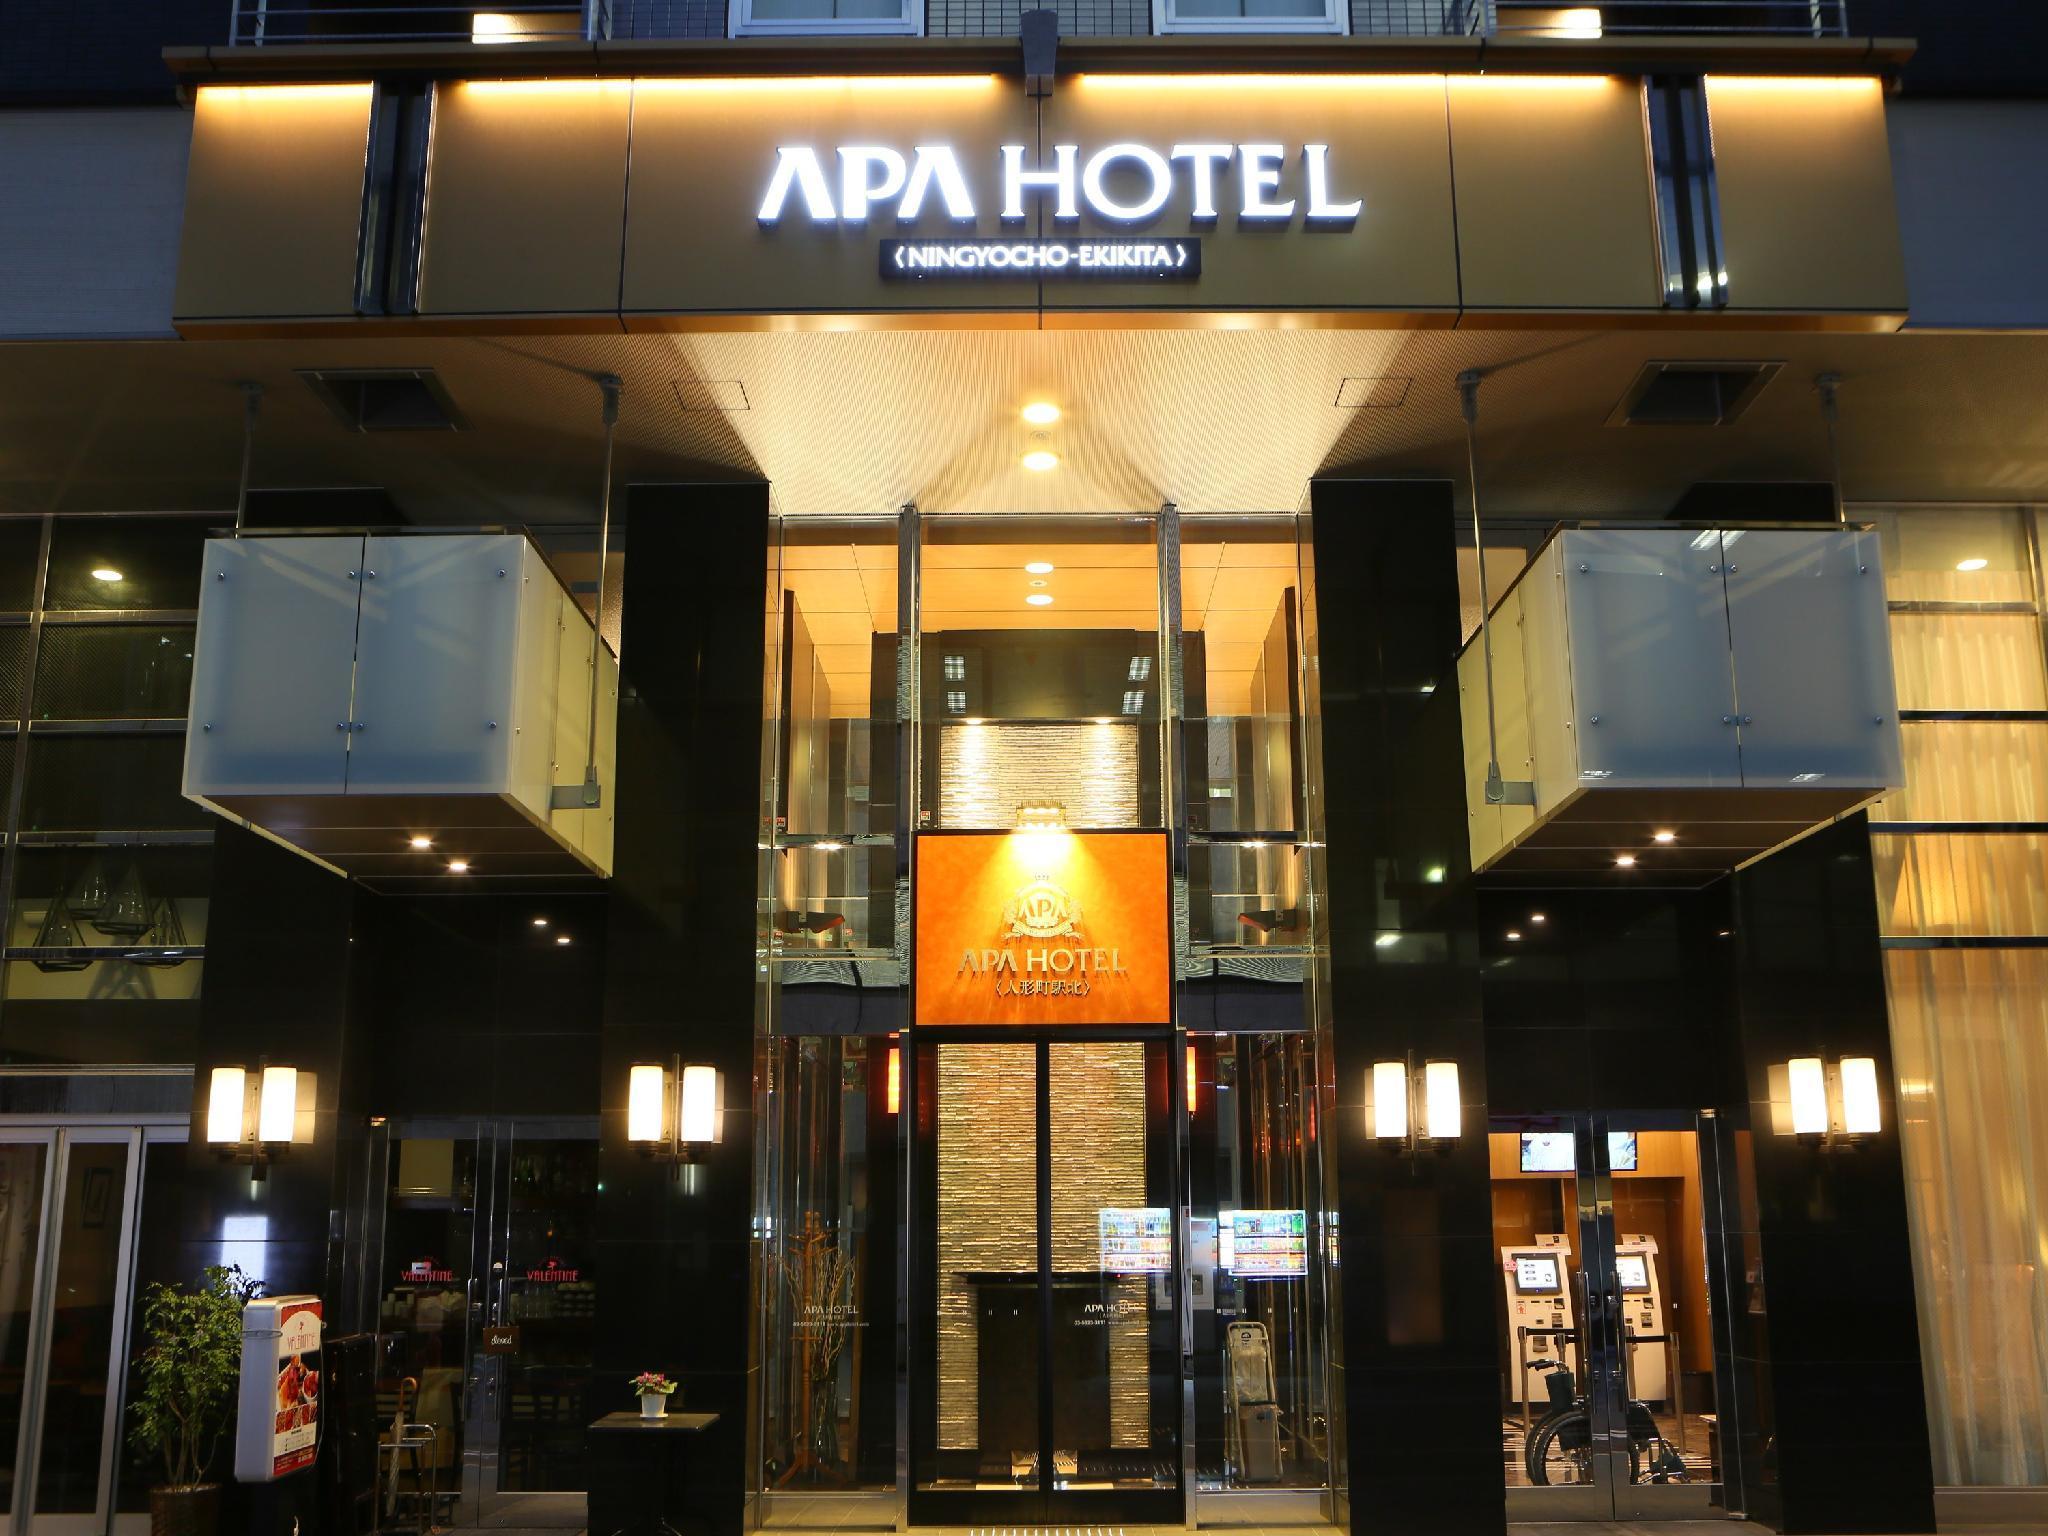 APA Hotel Ningyocho Eki Kita, Chiyoda